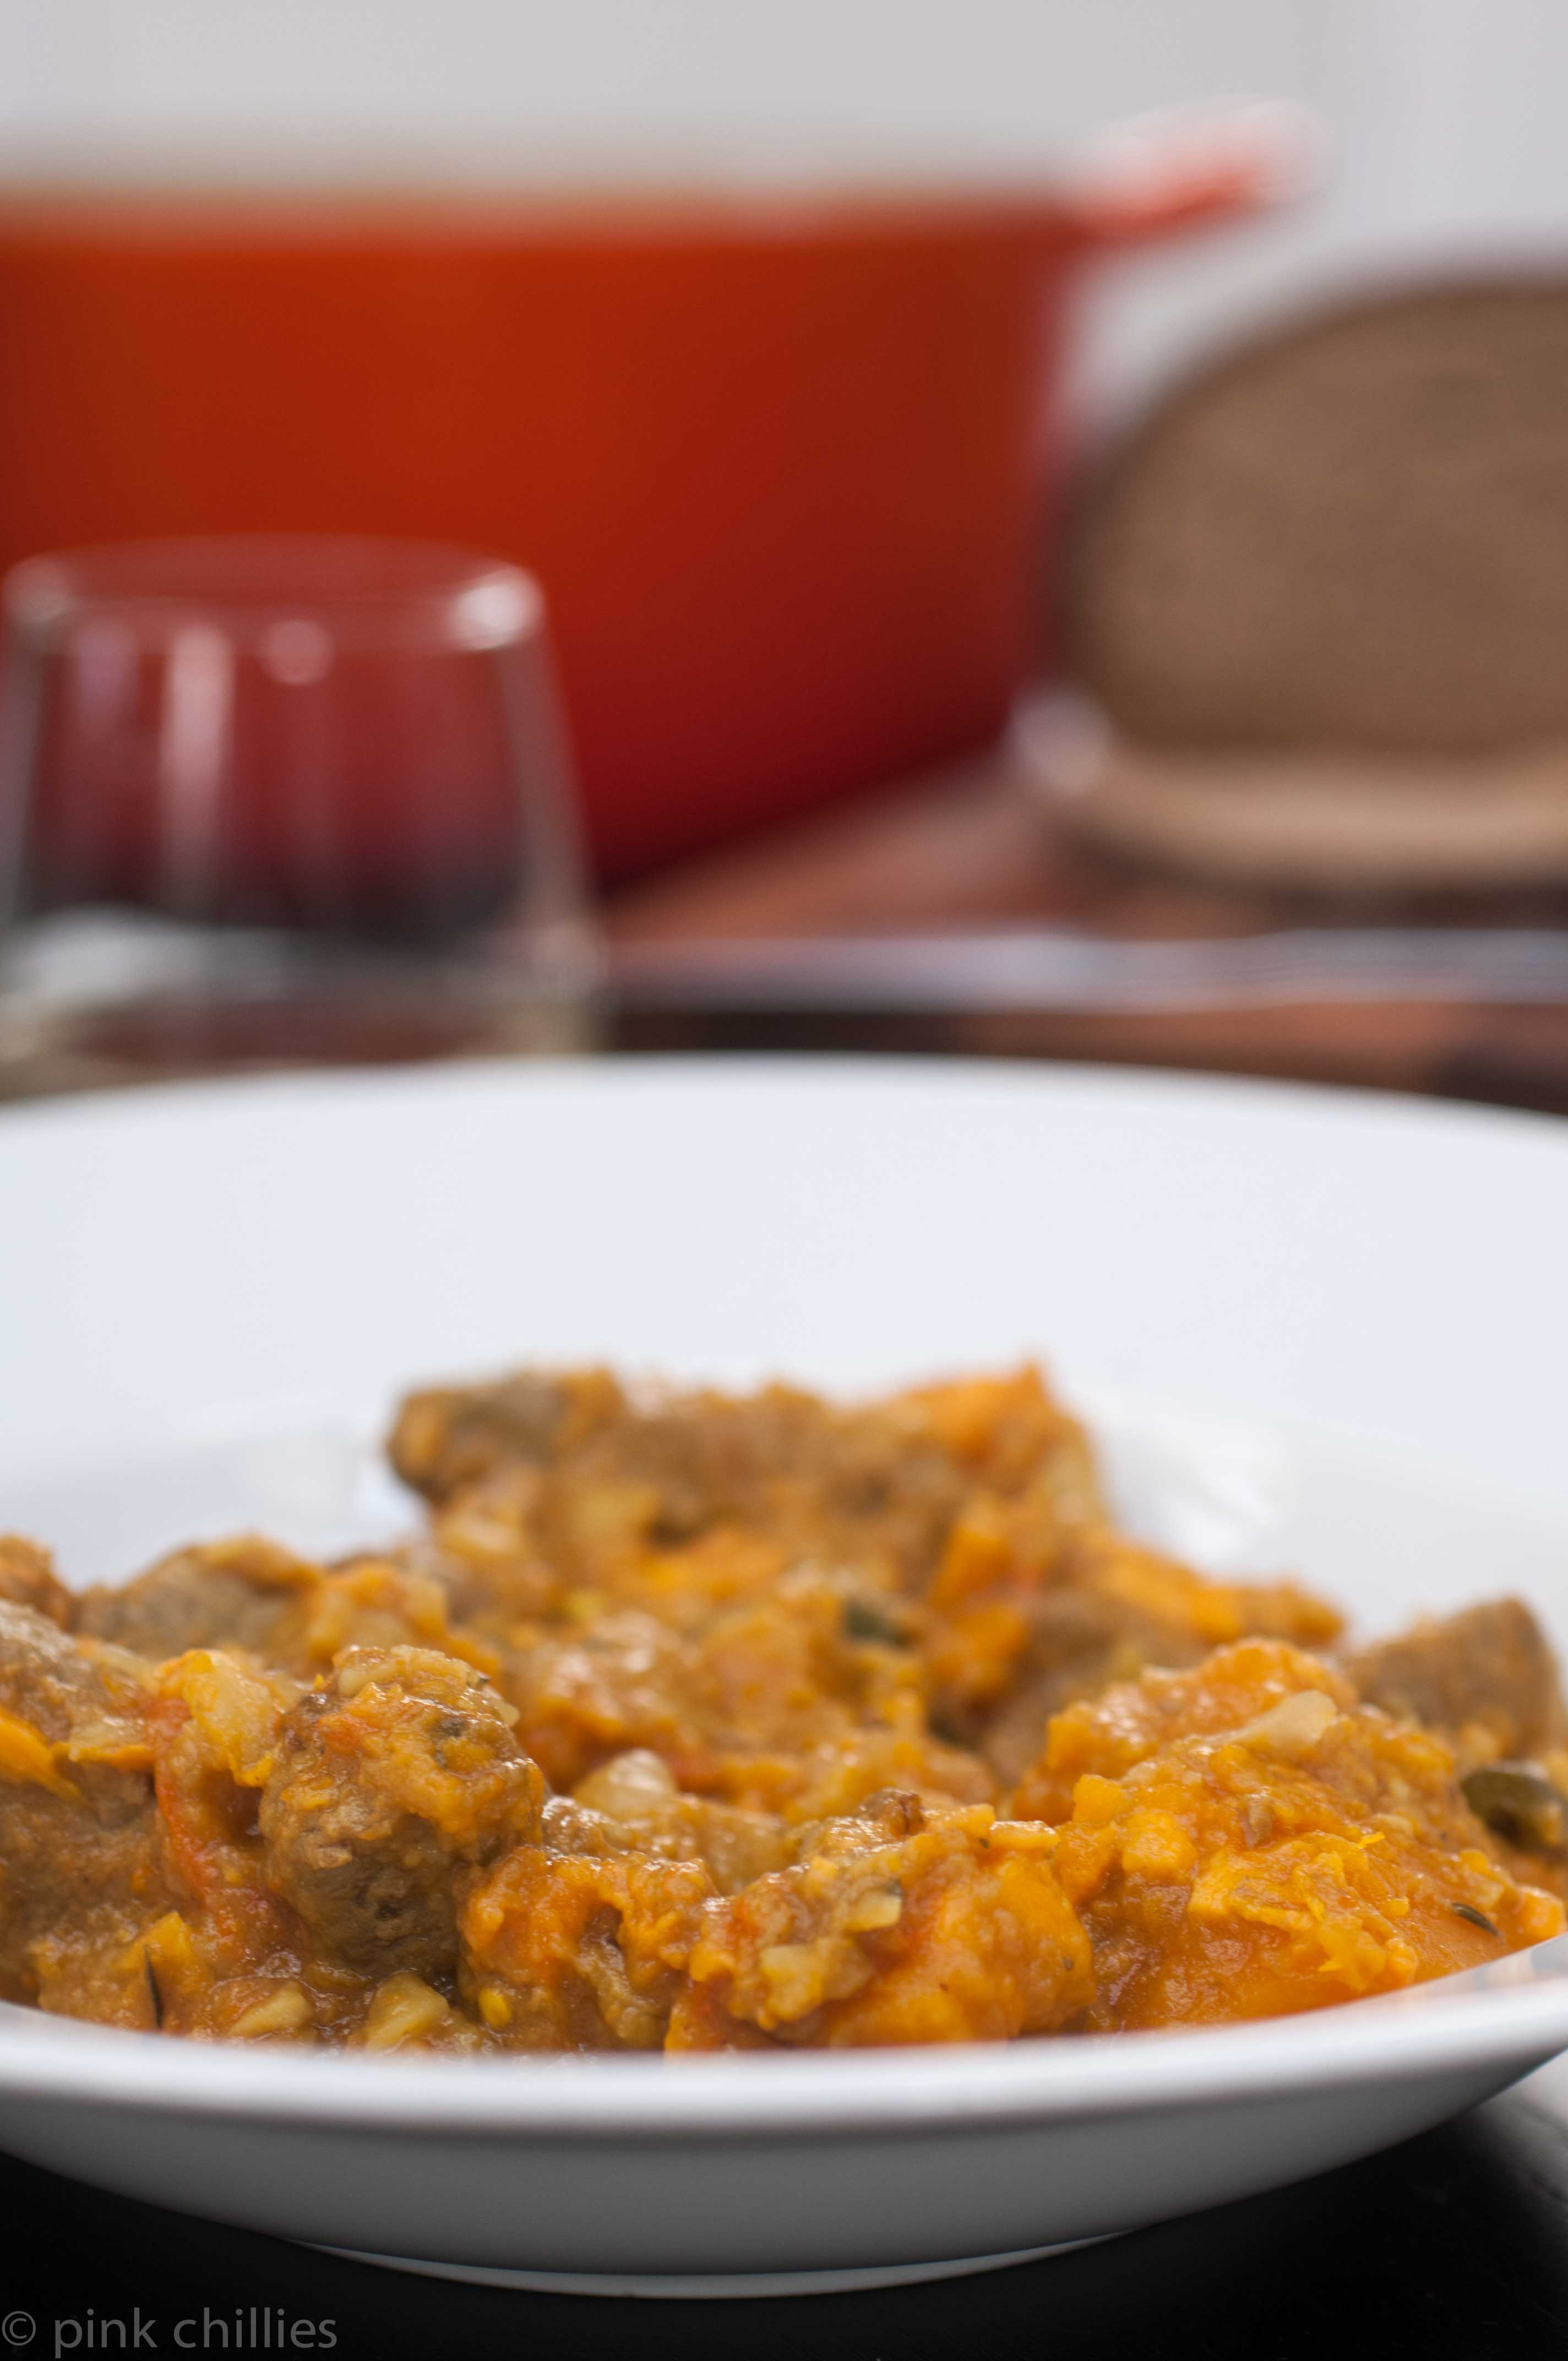 Kürbis-Süßkartoffel-Eintopf